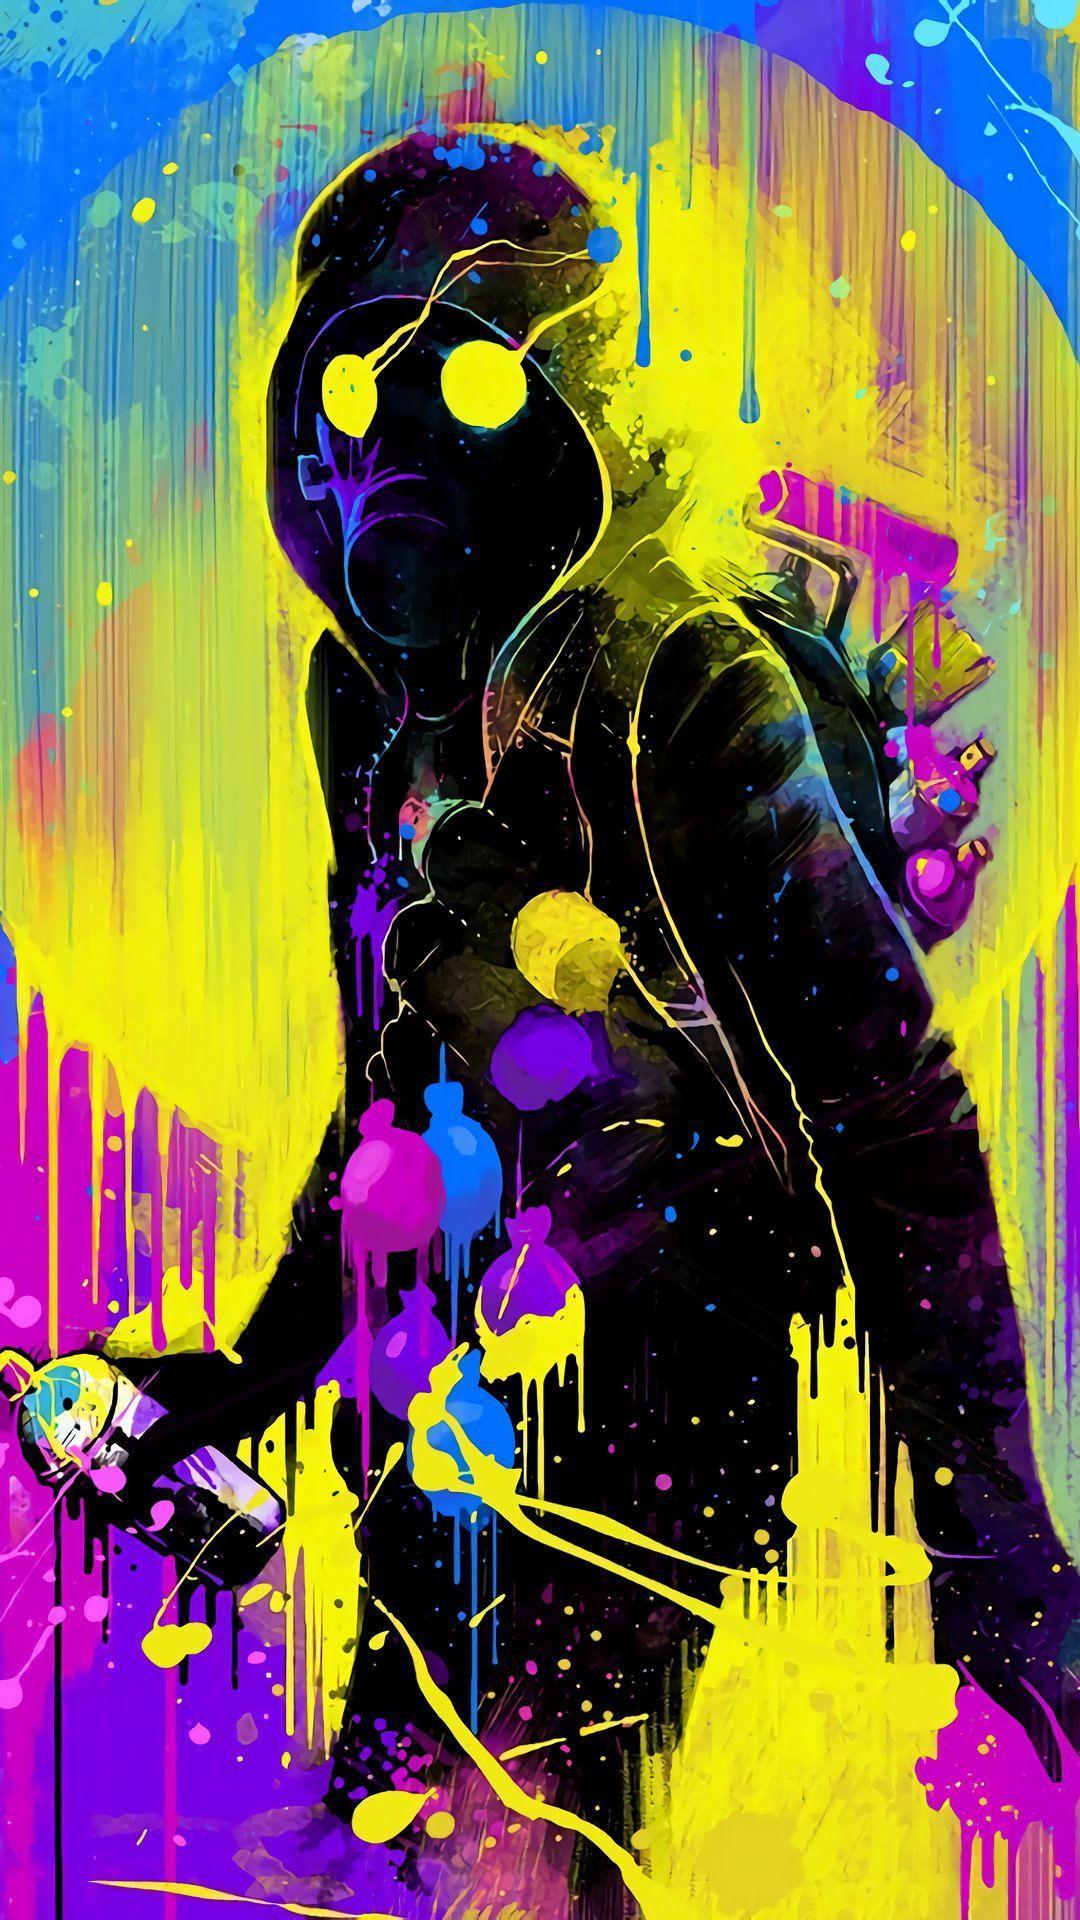 Graffiti Phone Wallpapers Top Free Graffiti Phone Backgrounds Wallpaperaccess